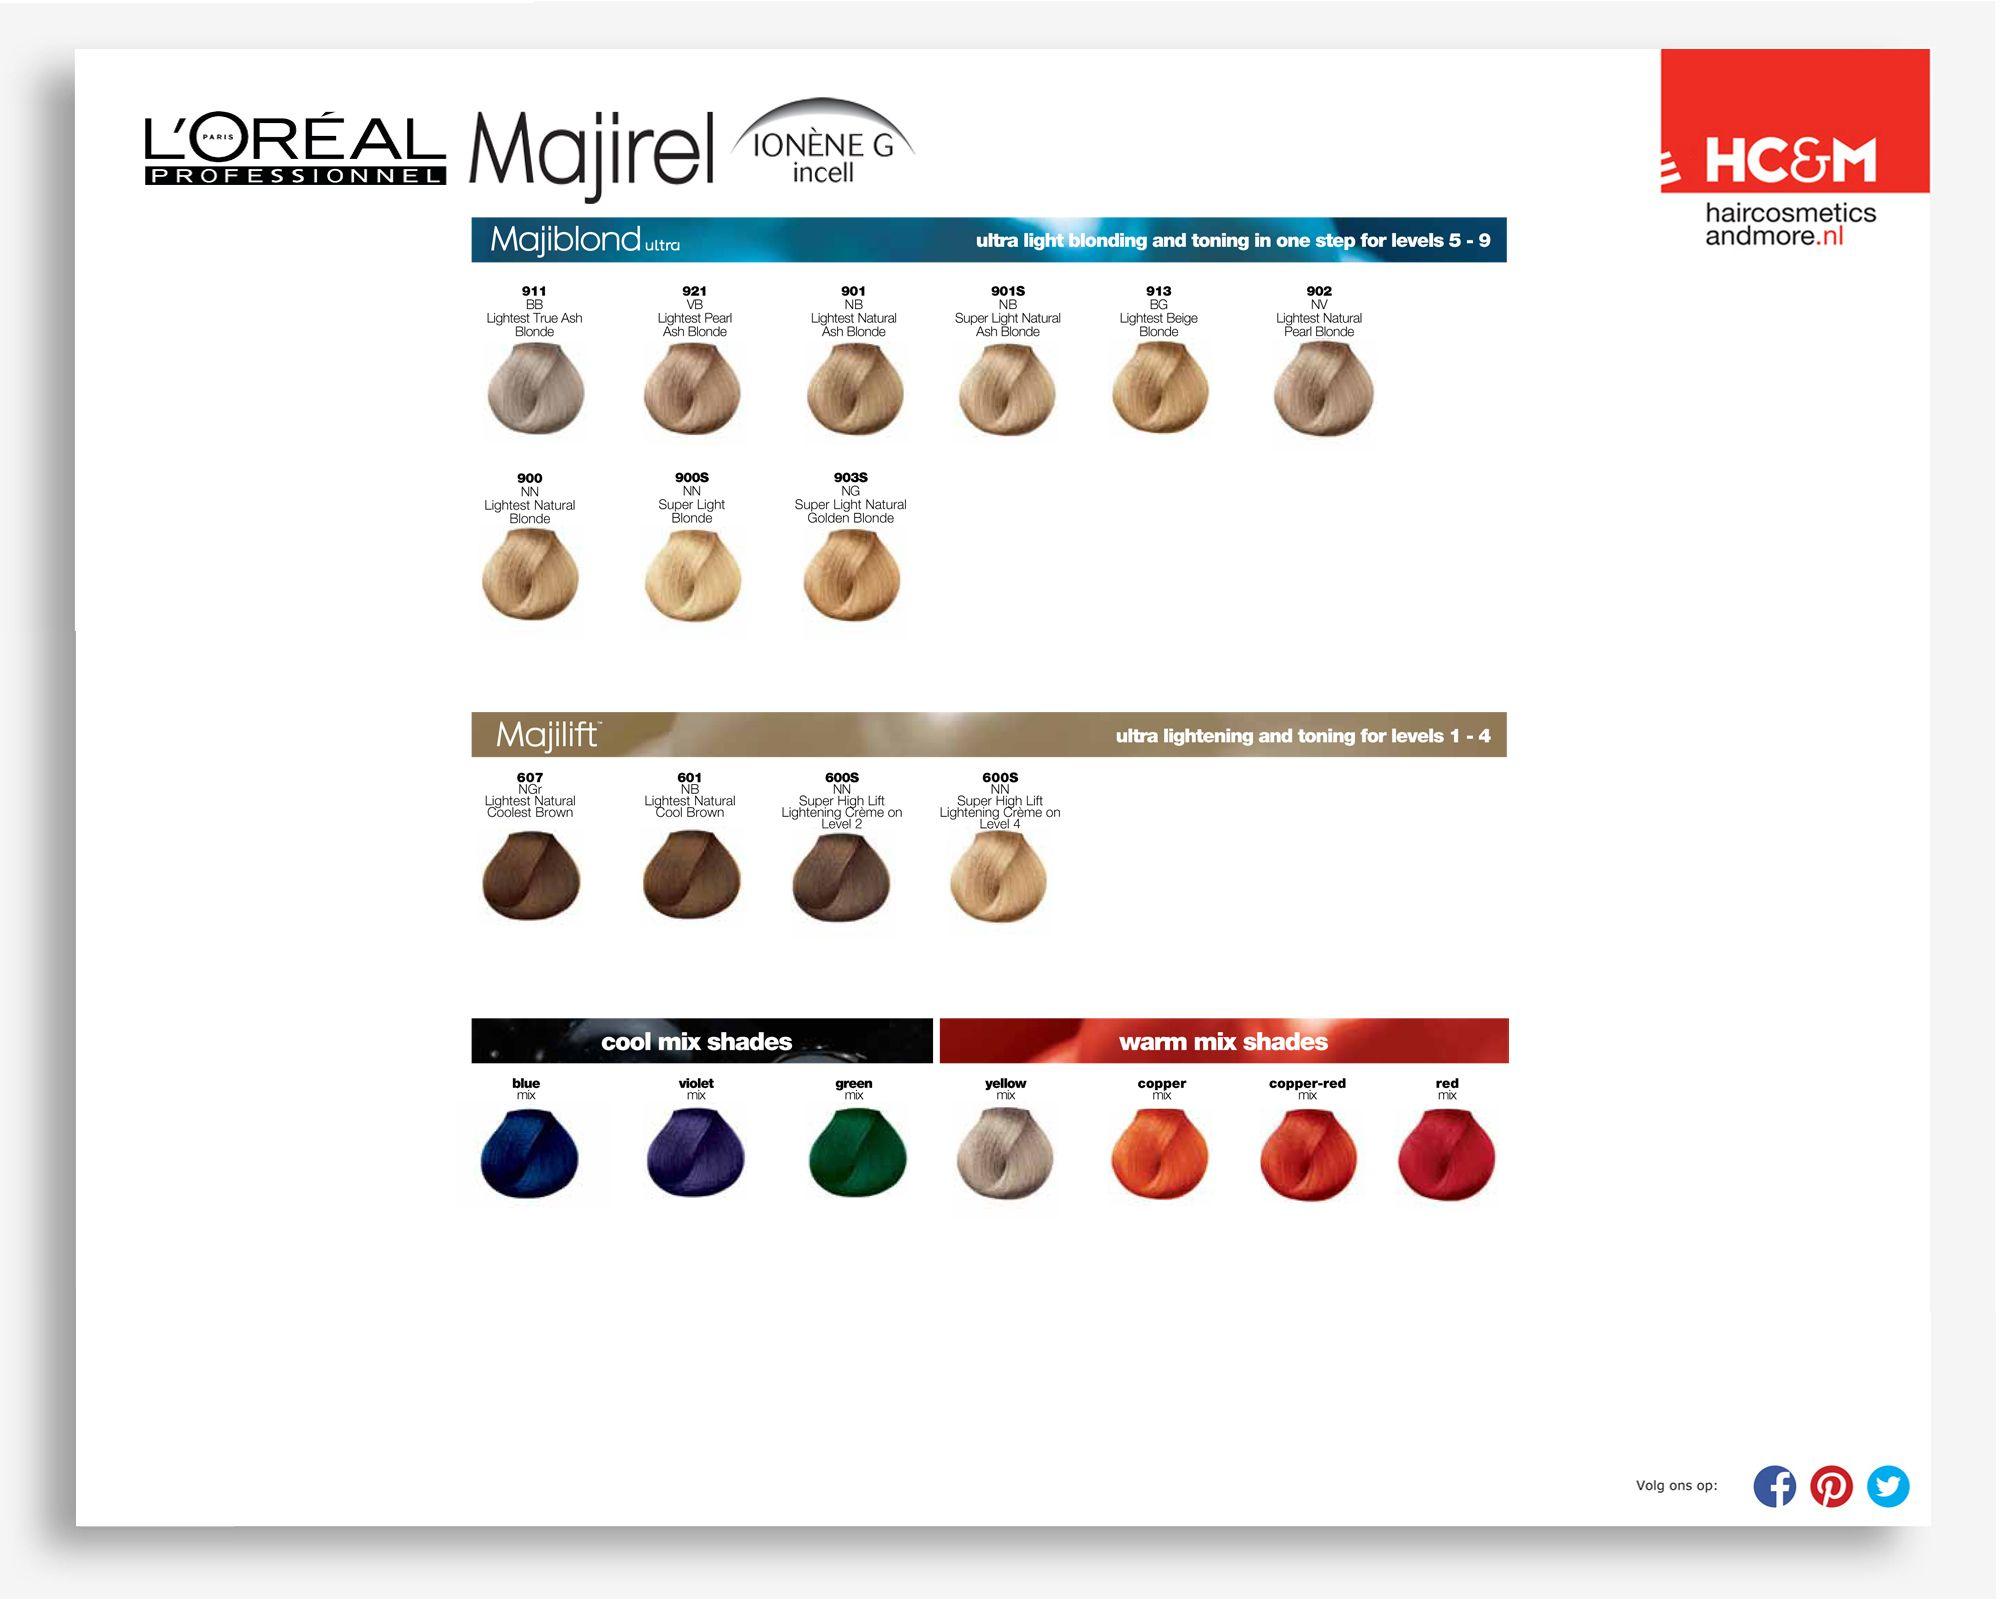 Majirel colour chart - L Or Al Professionel Majirel Majiblond Majilift Cool Mix Shades Warm Mix Shades Color Chartsbleach